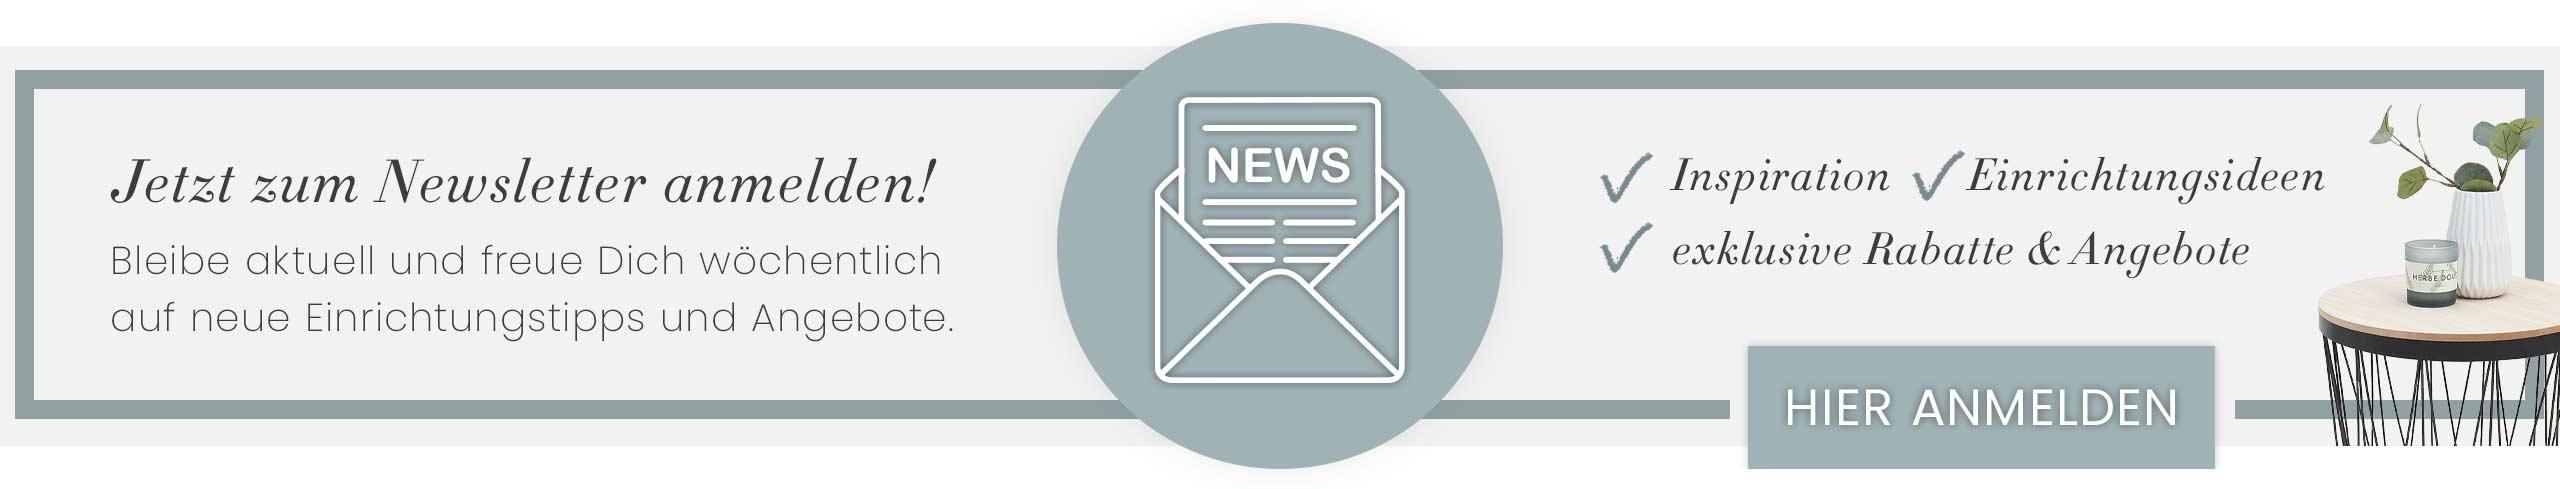 Newsletter Banner Footer